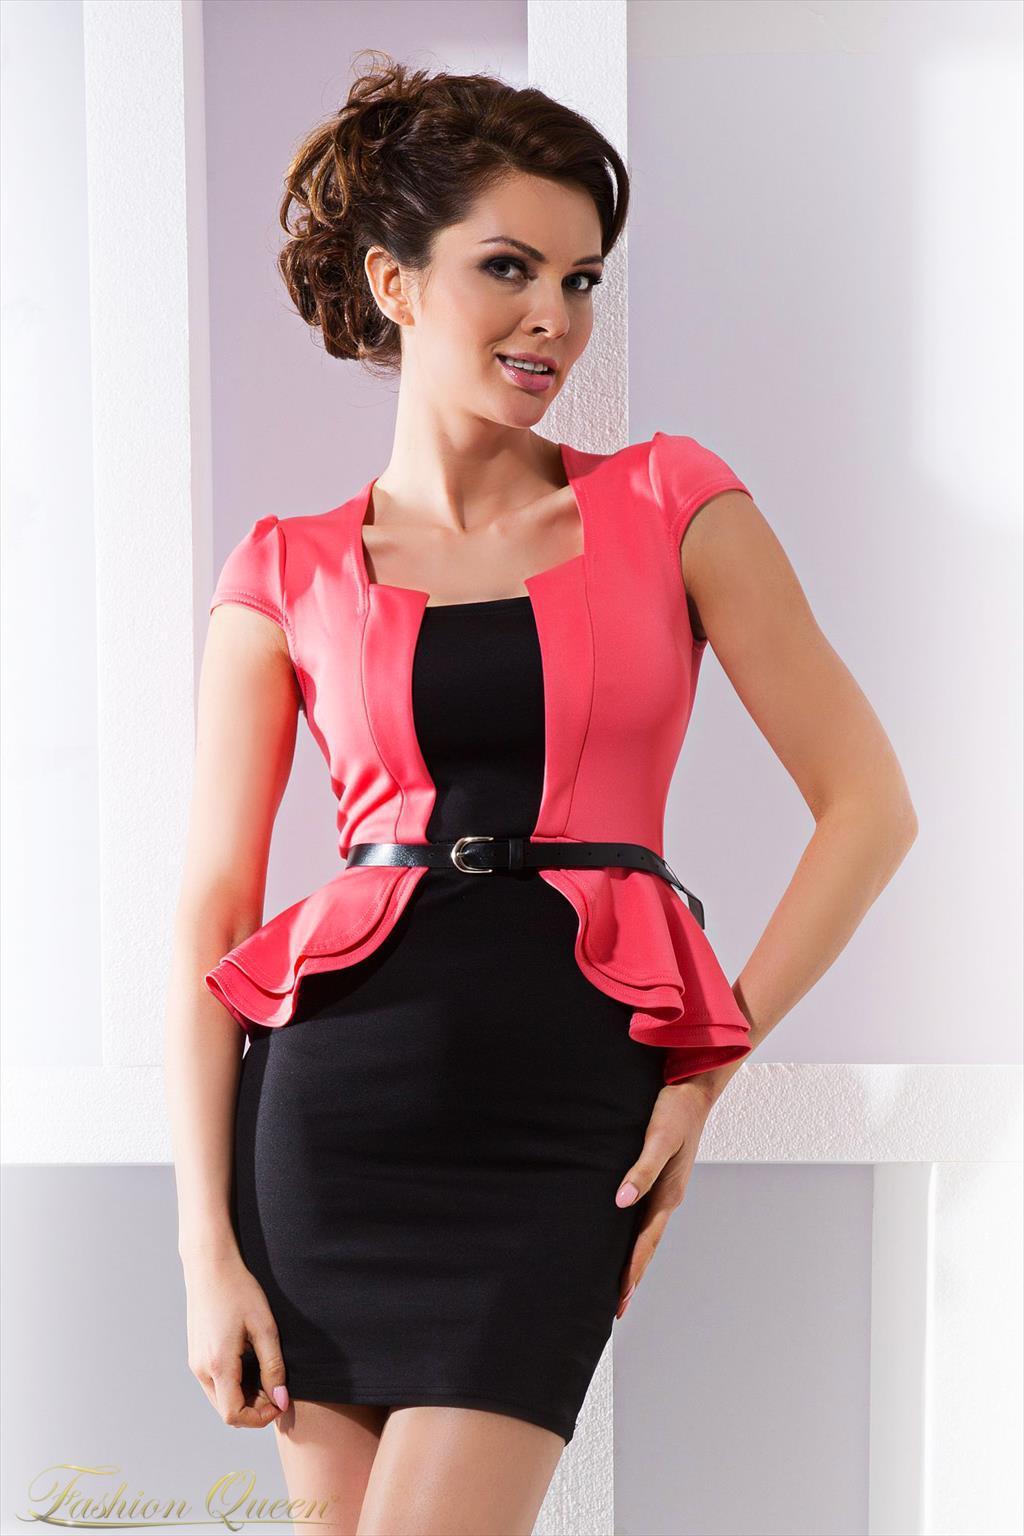 4d042b60eeea Fashion Queen - Dámske oblečenie a móda - Elegantné šaty s krátkym ...